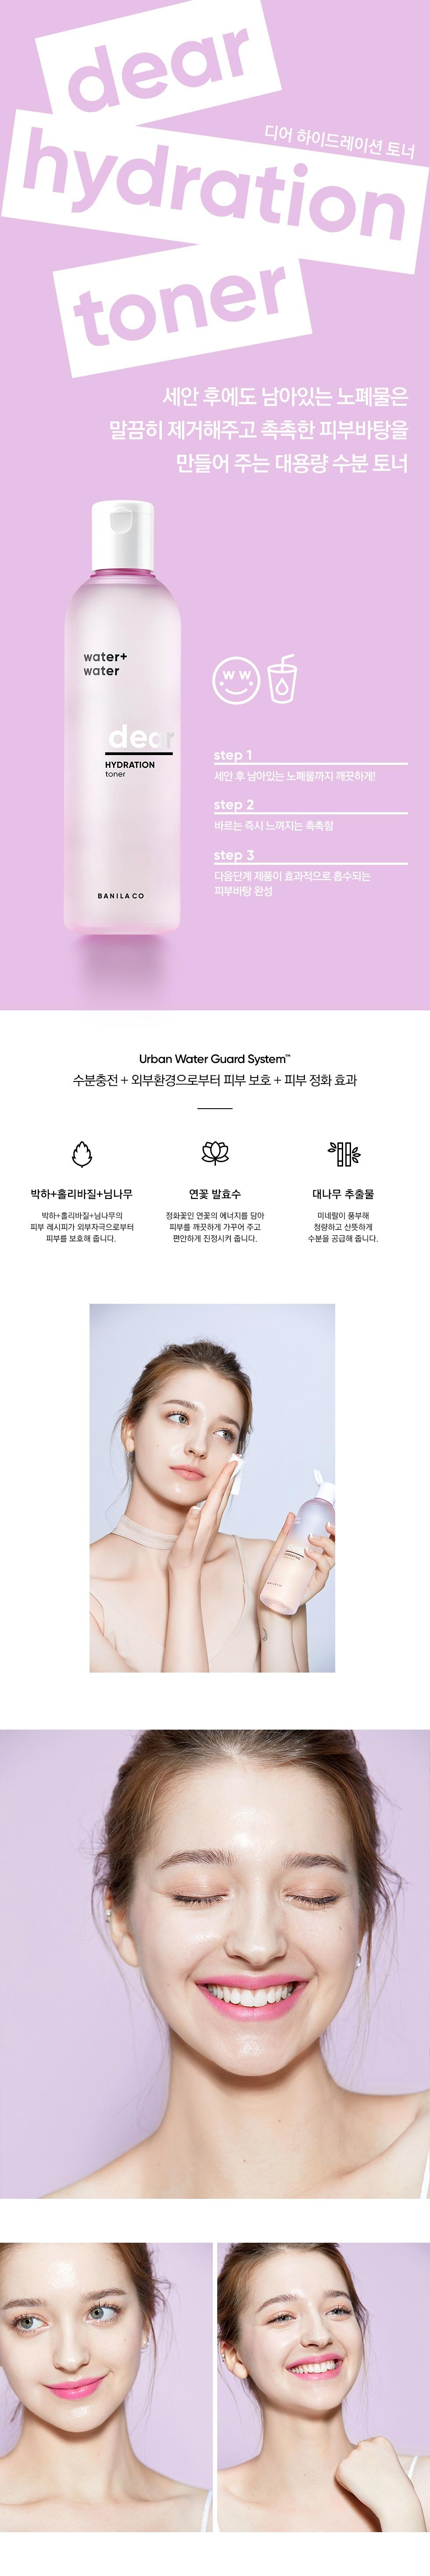 Banila Co Dear Hydration Toner korean cosmetic skincare product online shop malaysia macau singapore1